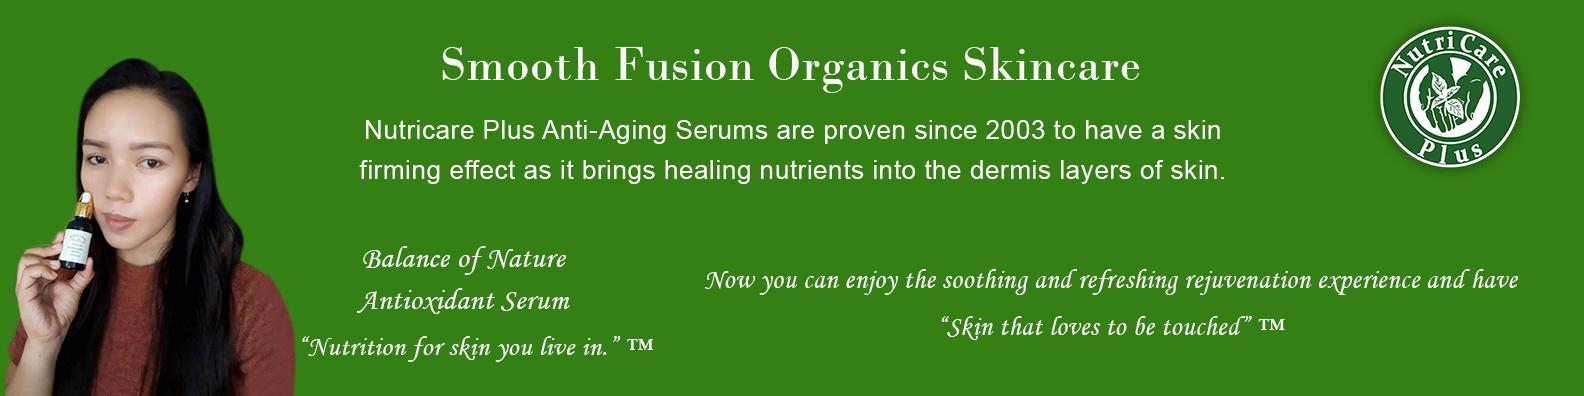 Balance of Nature Antioxidant Serum